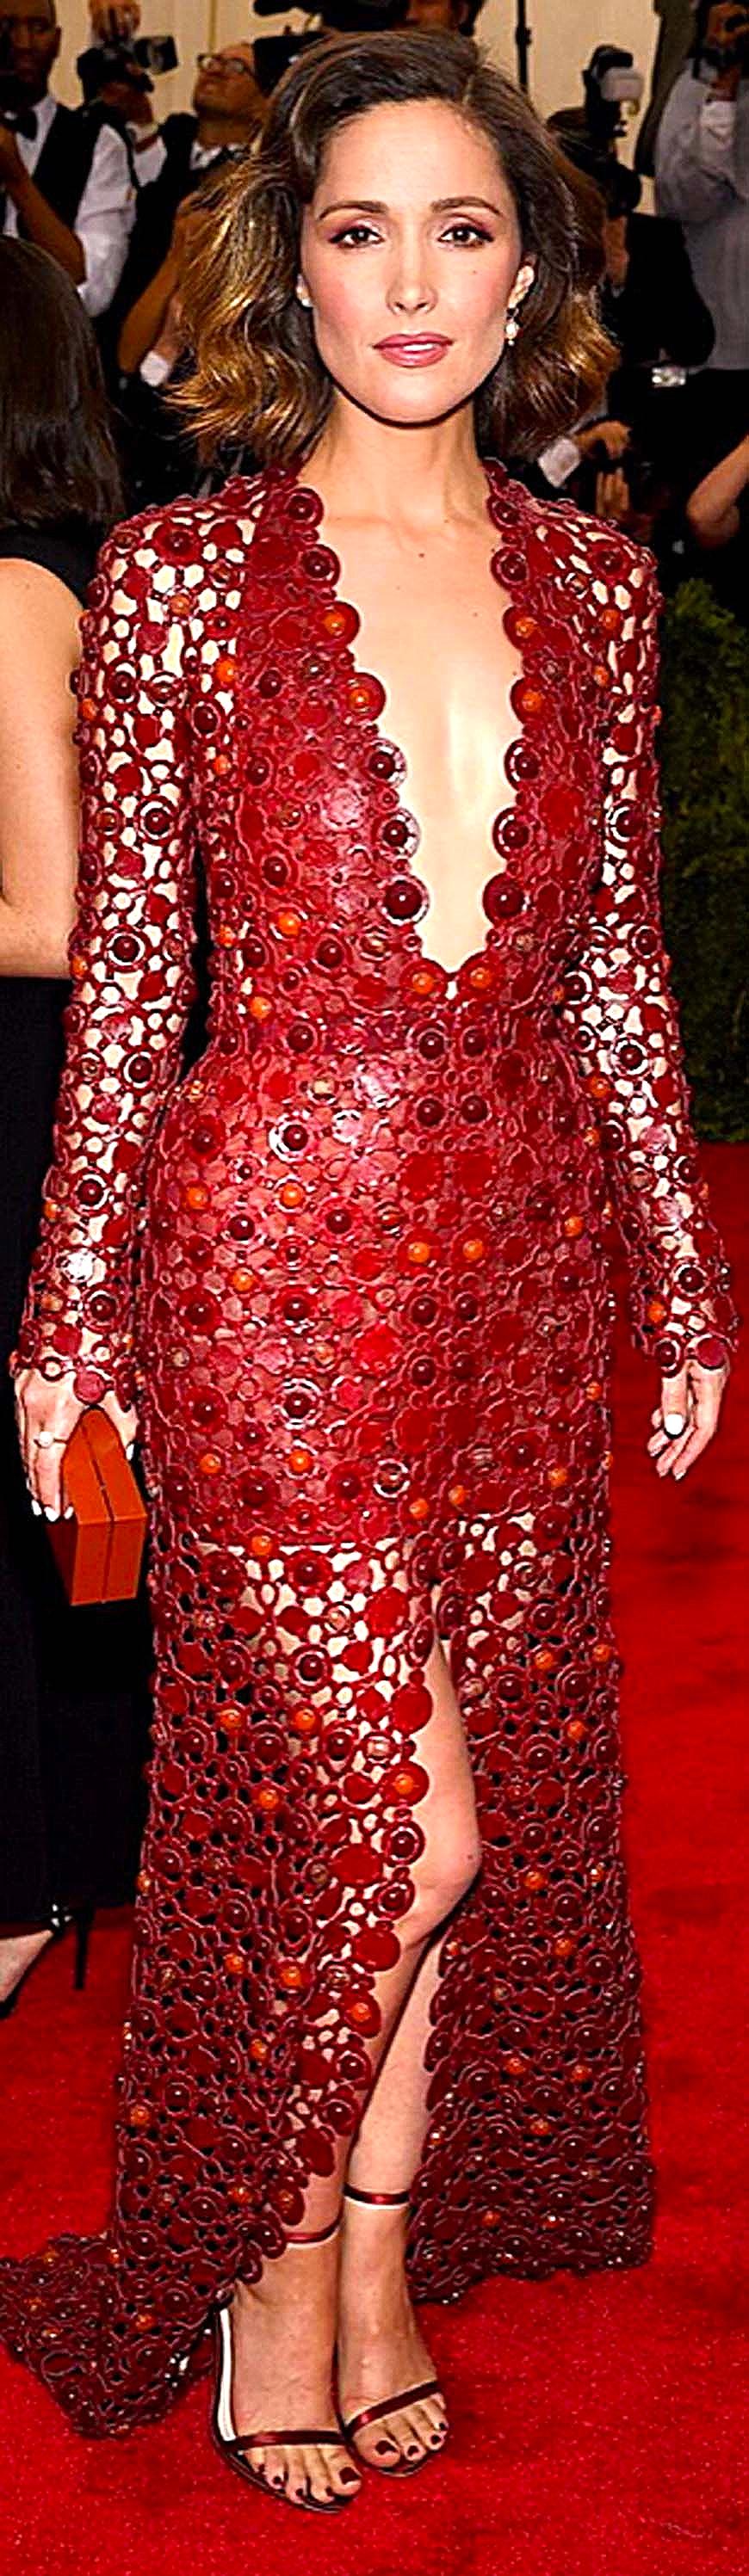 Rose Byrne in Calvin Klein Getty Images/ Dimitrios Kambouris